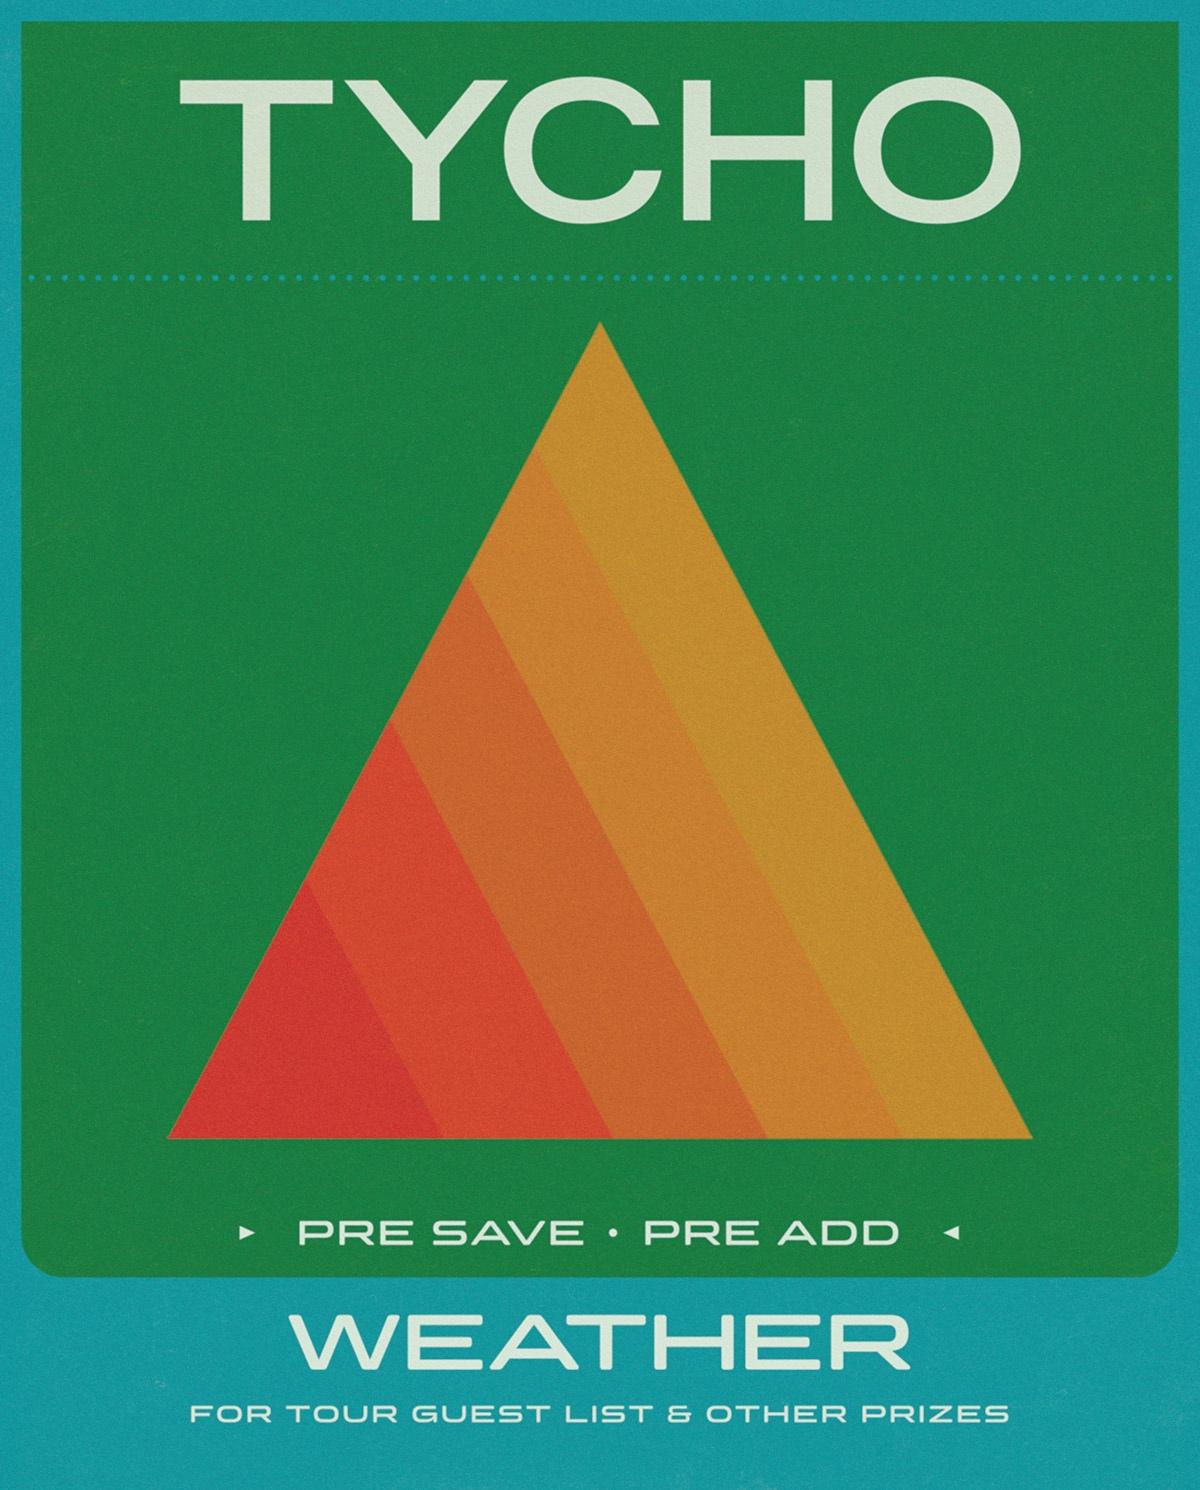 Tycho+-+Giveaway.jpg